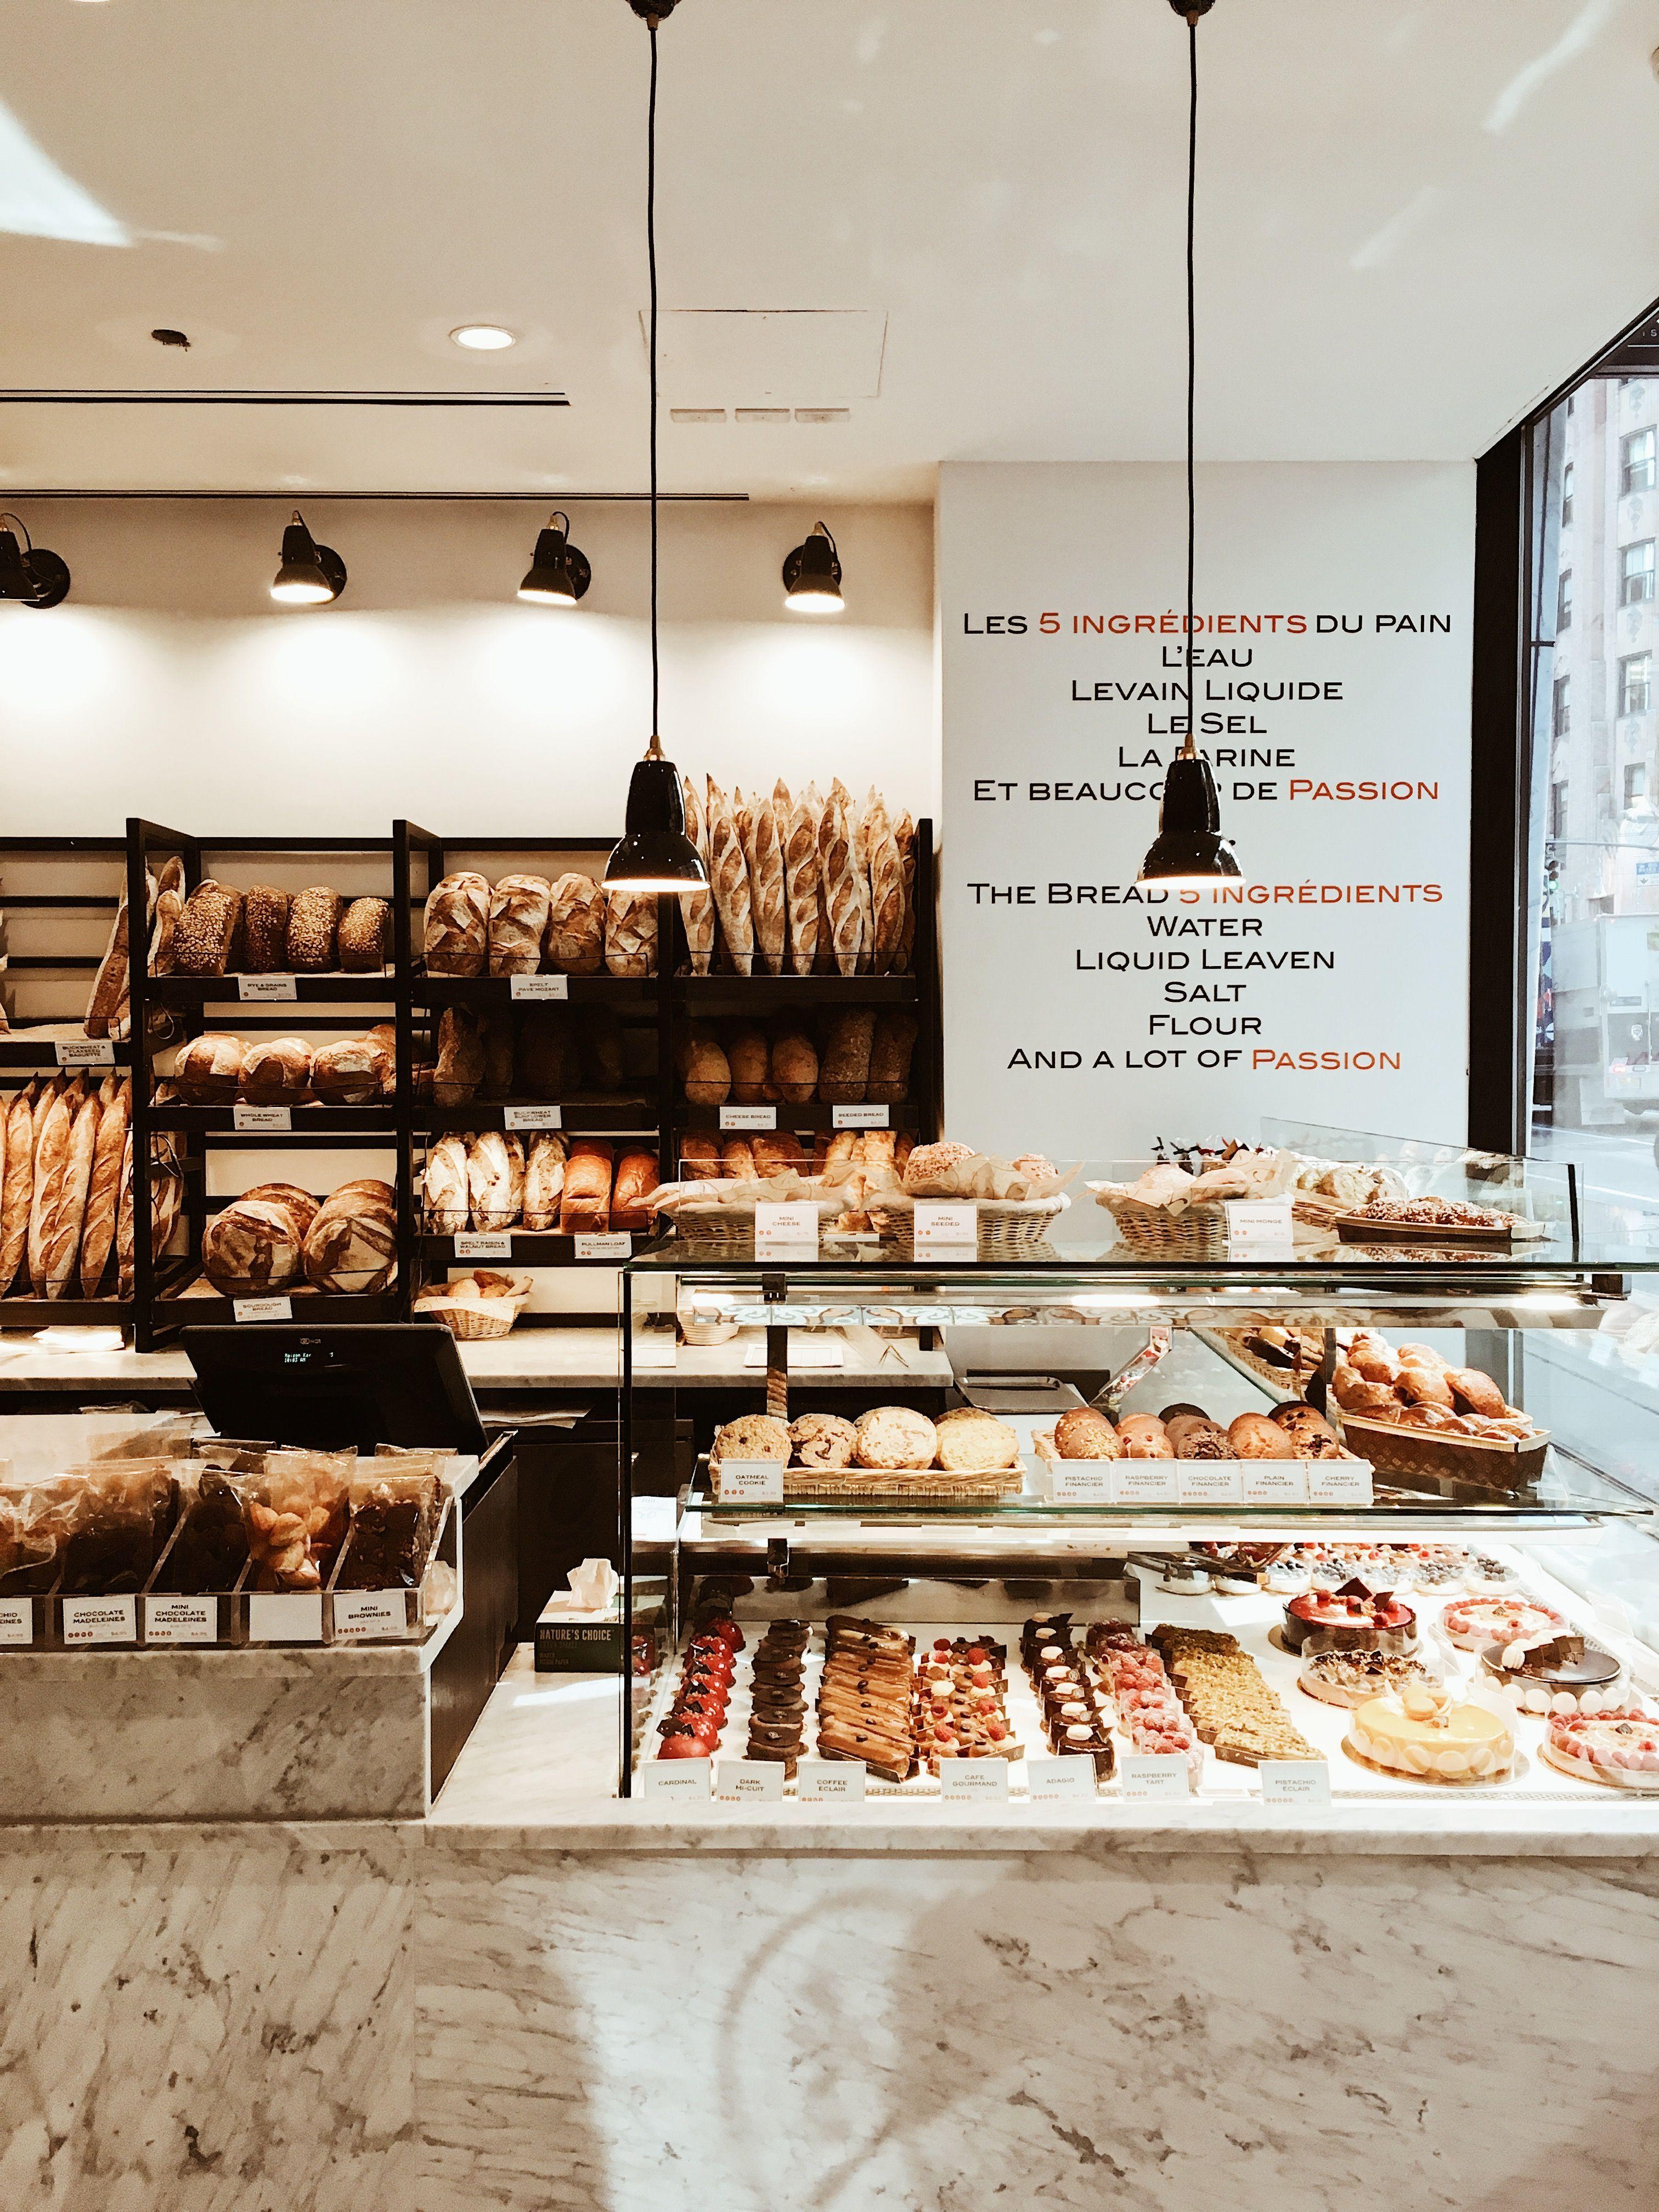 10 Coole Restaurants Cafes In New York Misses Popisses 10 Cool Restaurants Cafes In New York Misses Popisses Esta In 2020 Backerei Design Cafe Cafe Interieur